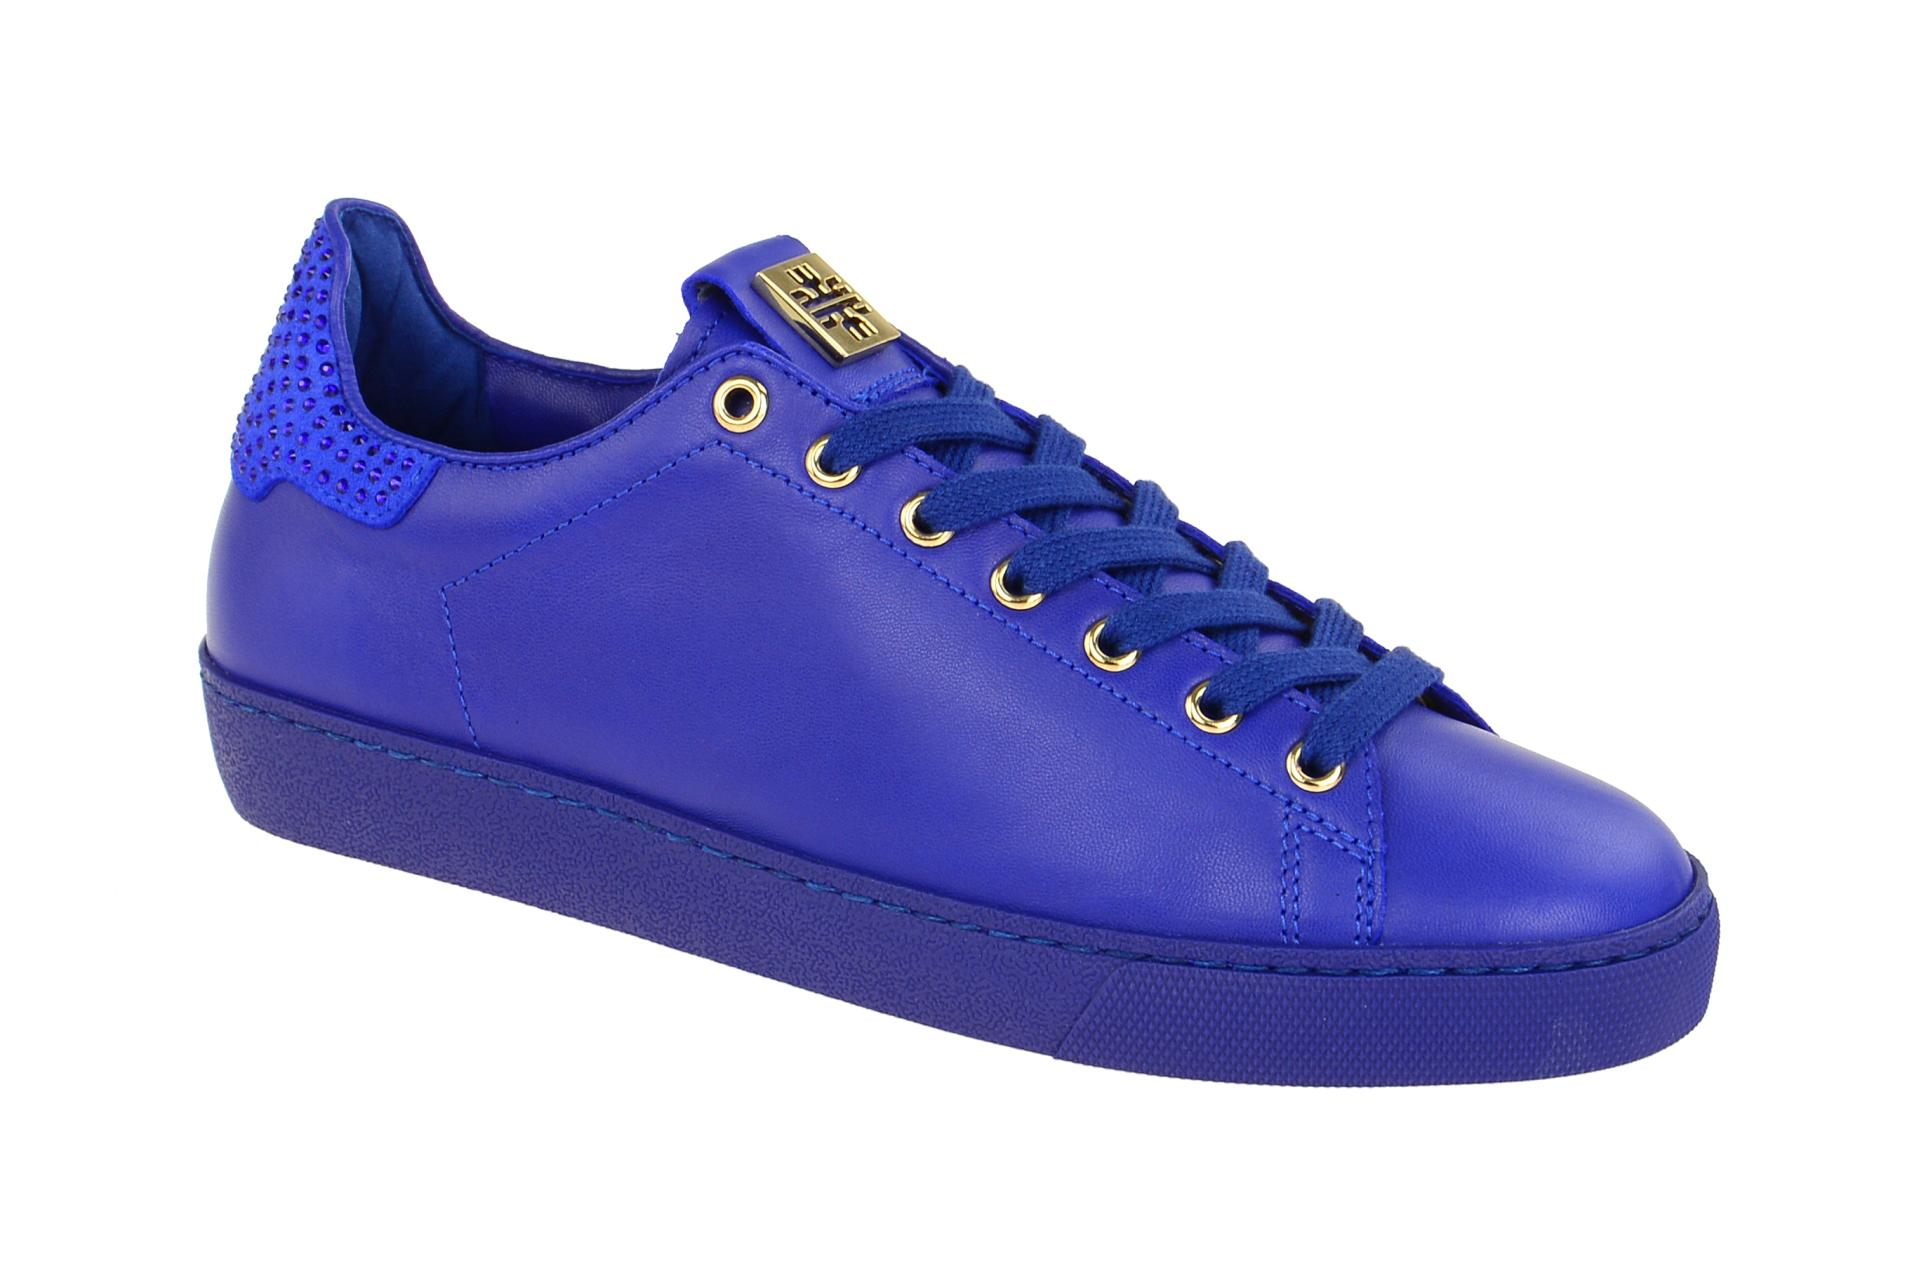 Högl Schuhe schwarz Glamour glitter NEU FZCZsL3n